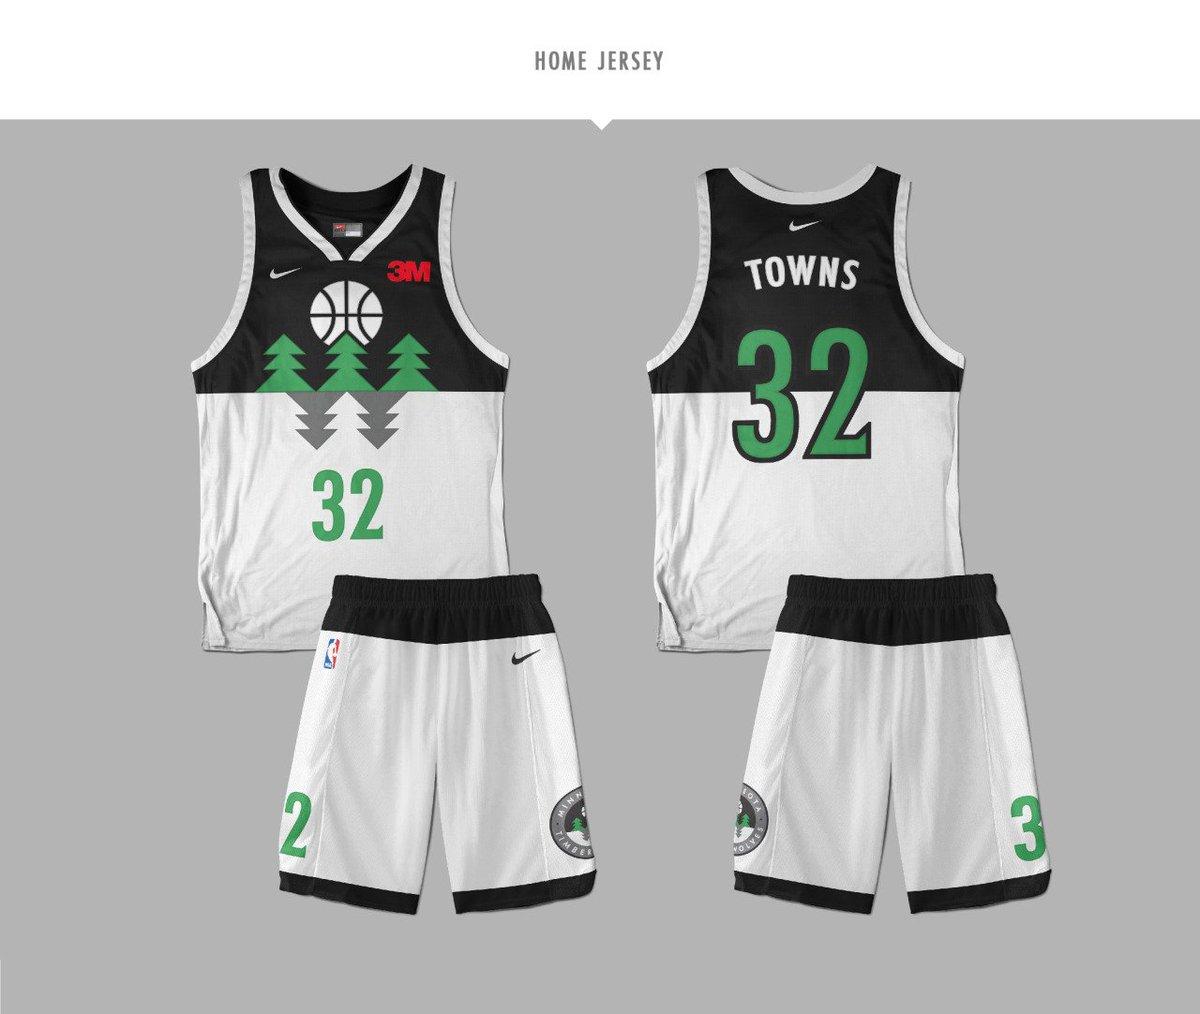 Minnesota Timberwolves Jersey Redesign